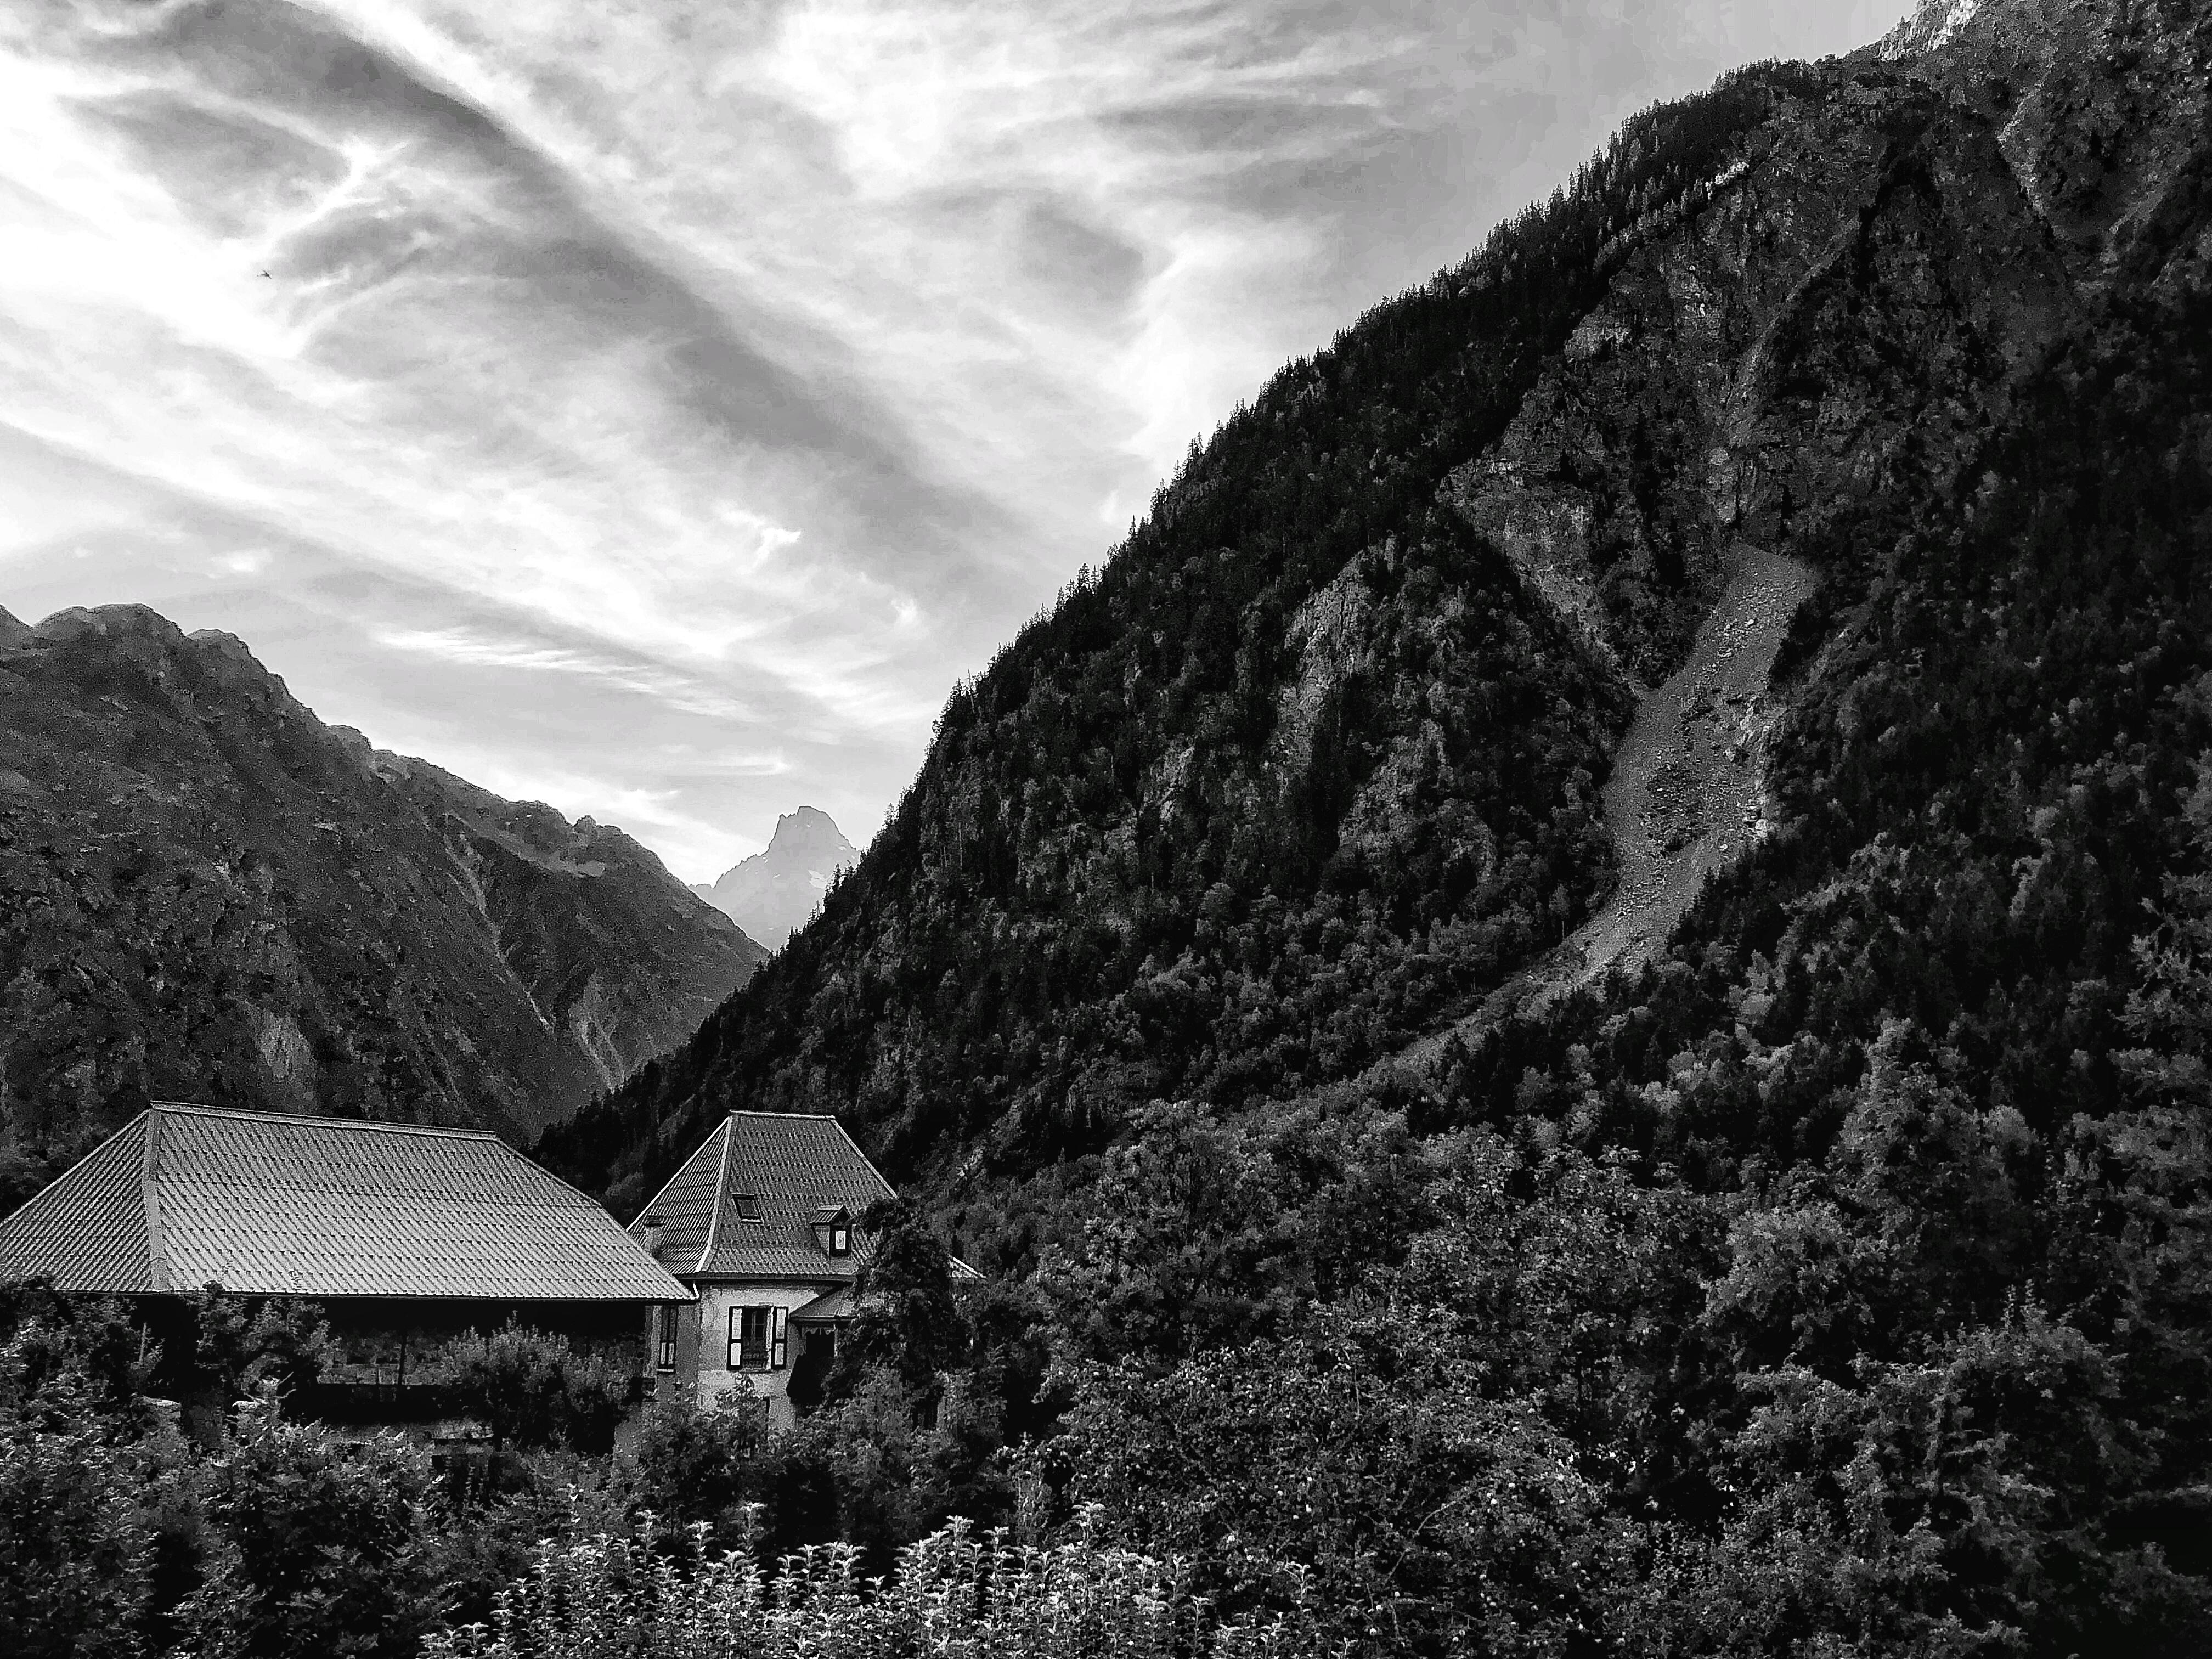 Lauvital Lodge, La Danchere, France, July, 2020